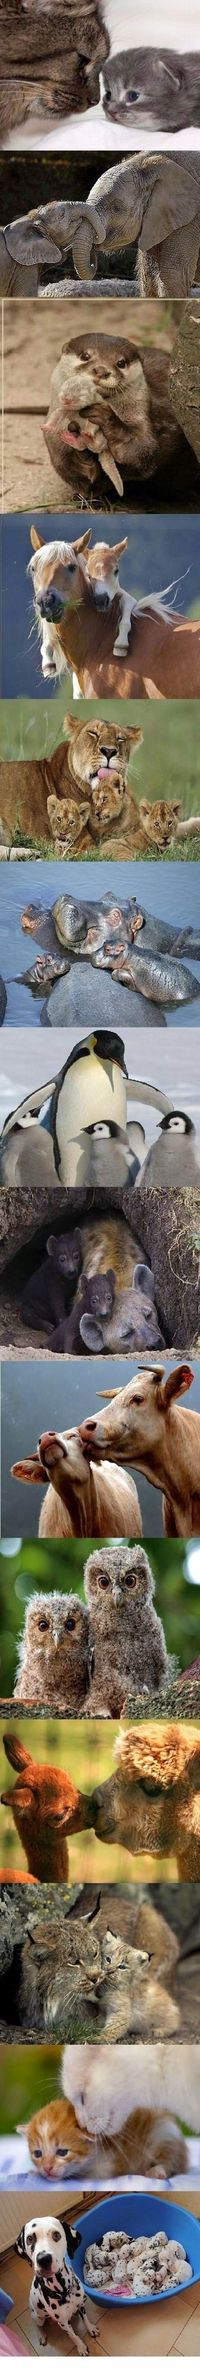 Animal mommys